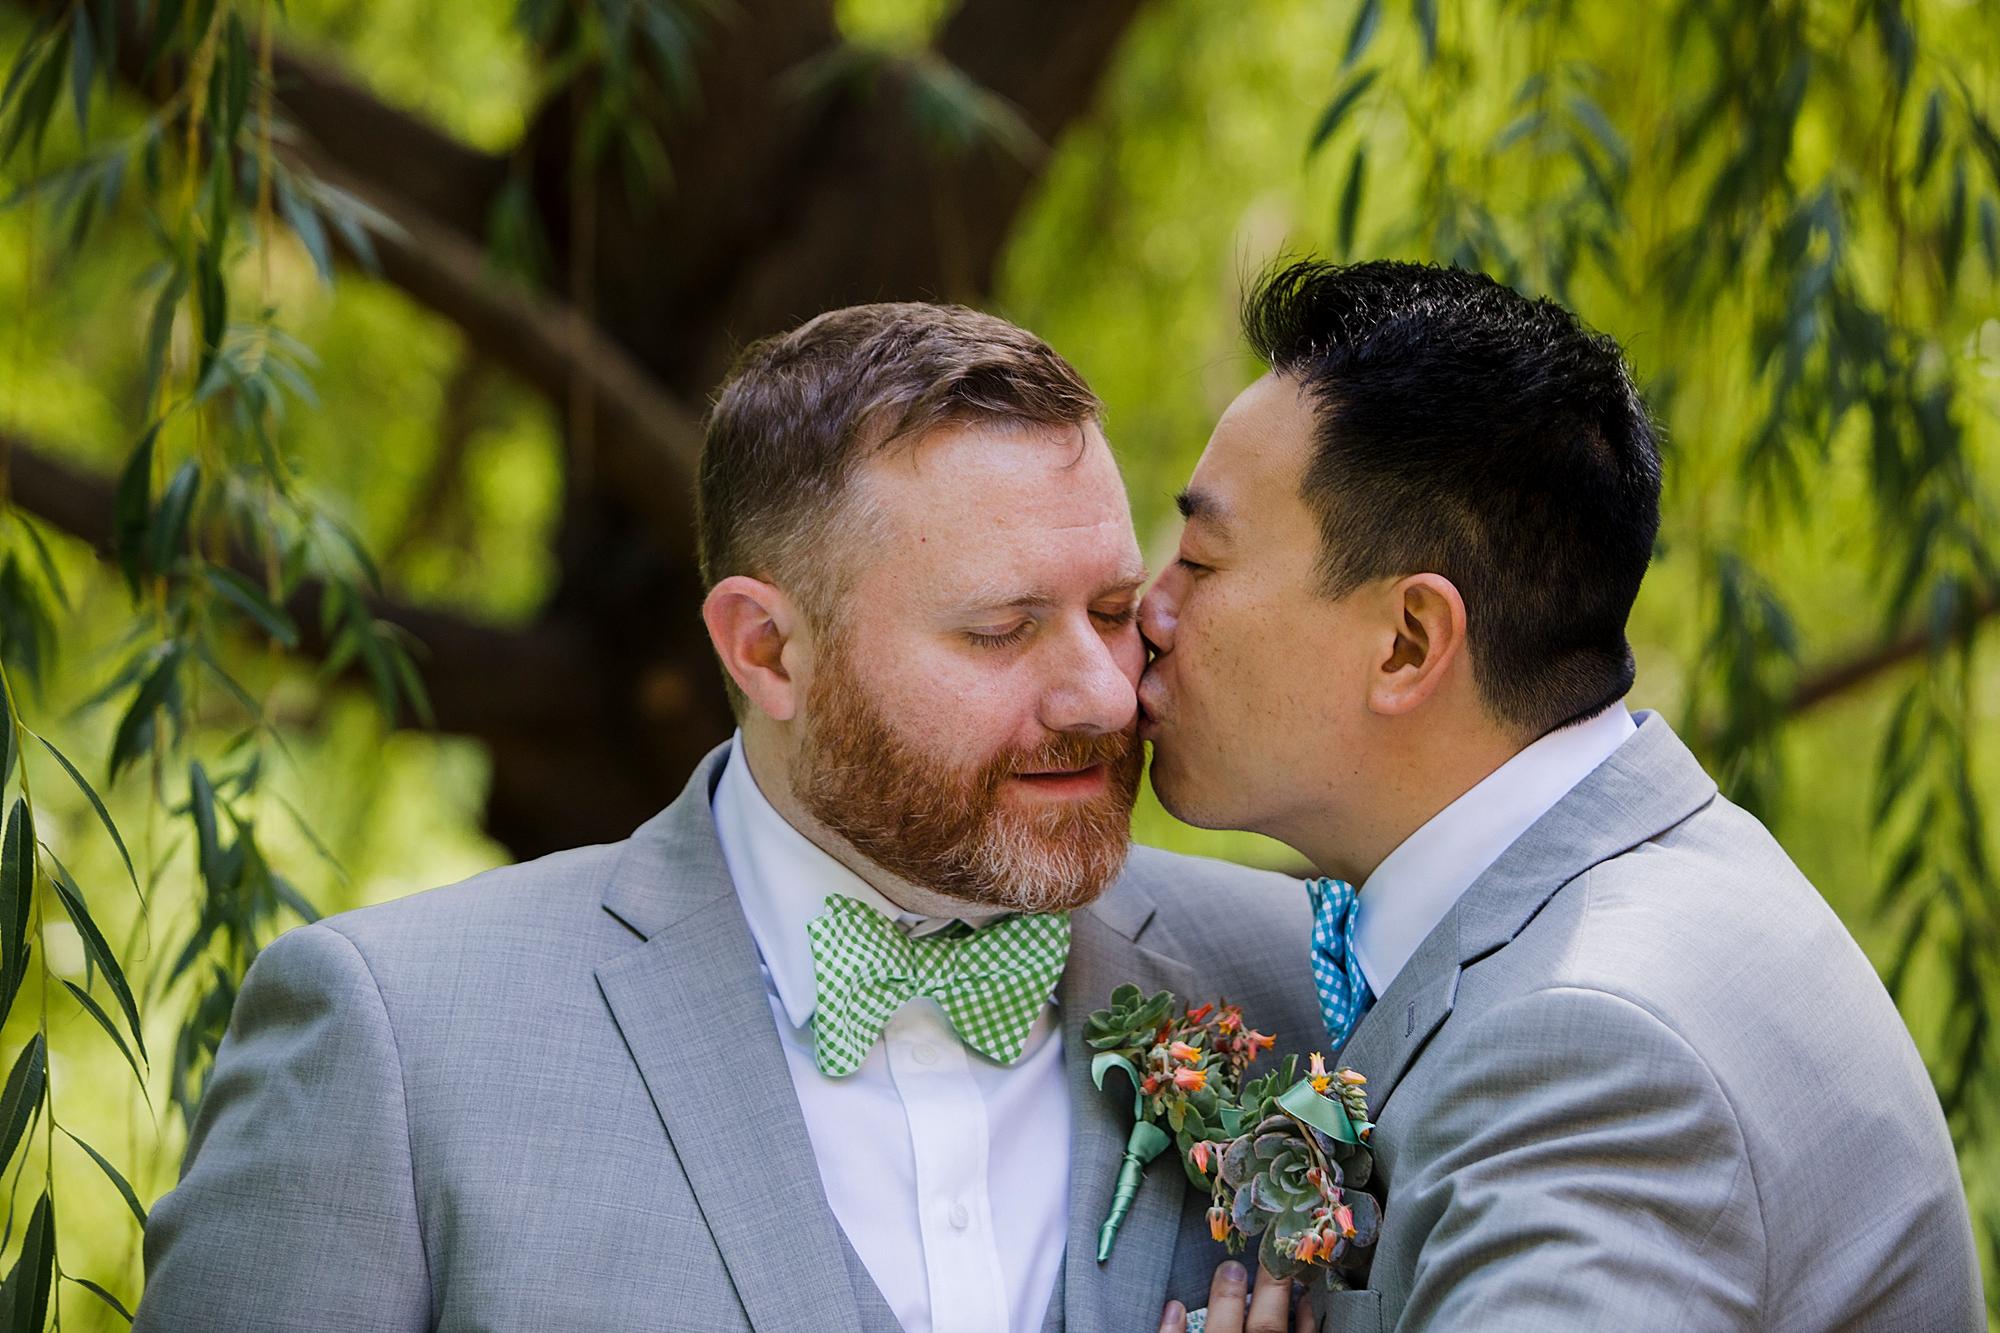 Dan_and_Byron_Love_by_Joe_Mac_Philadelphia_Wedding_LGBTQ_Photography_Gay_Independence_visitor_Center_50.JPG